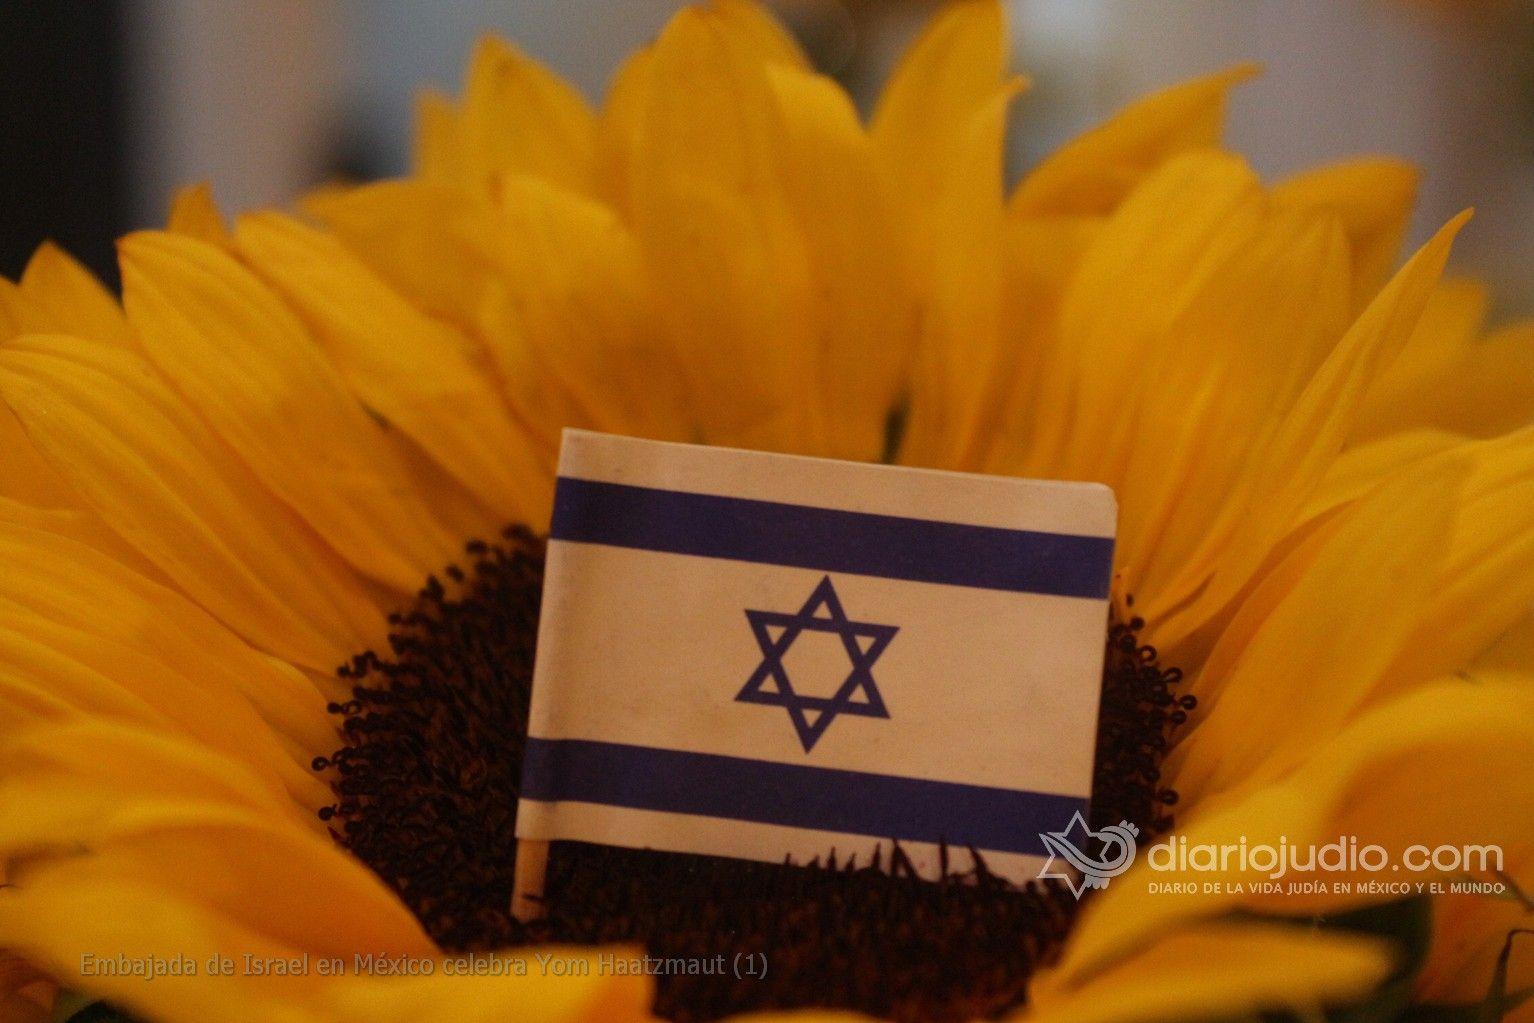 buen fin-SHABAT SHALOM- A GUT SHABES te deseamos @diariojudio @judiosenmexico @unidosxisrael @israelinmexico